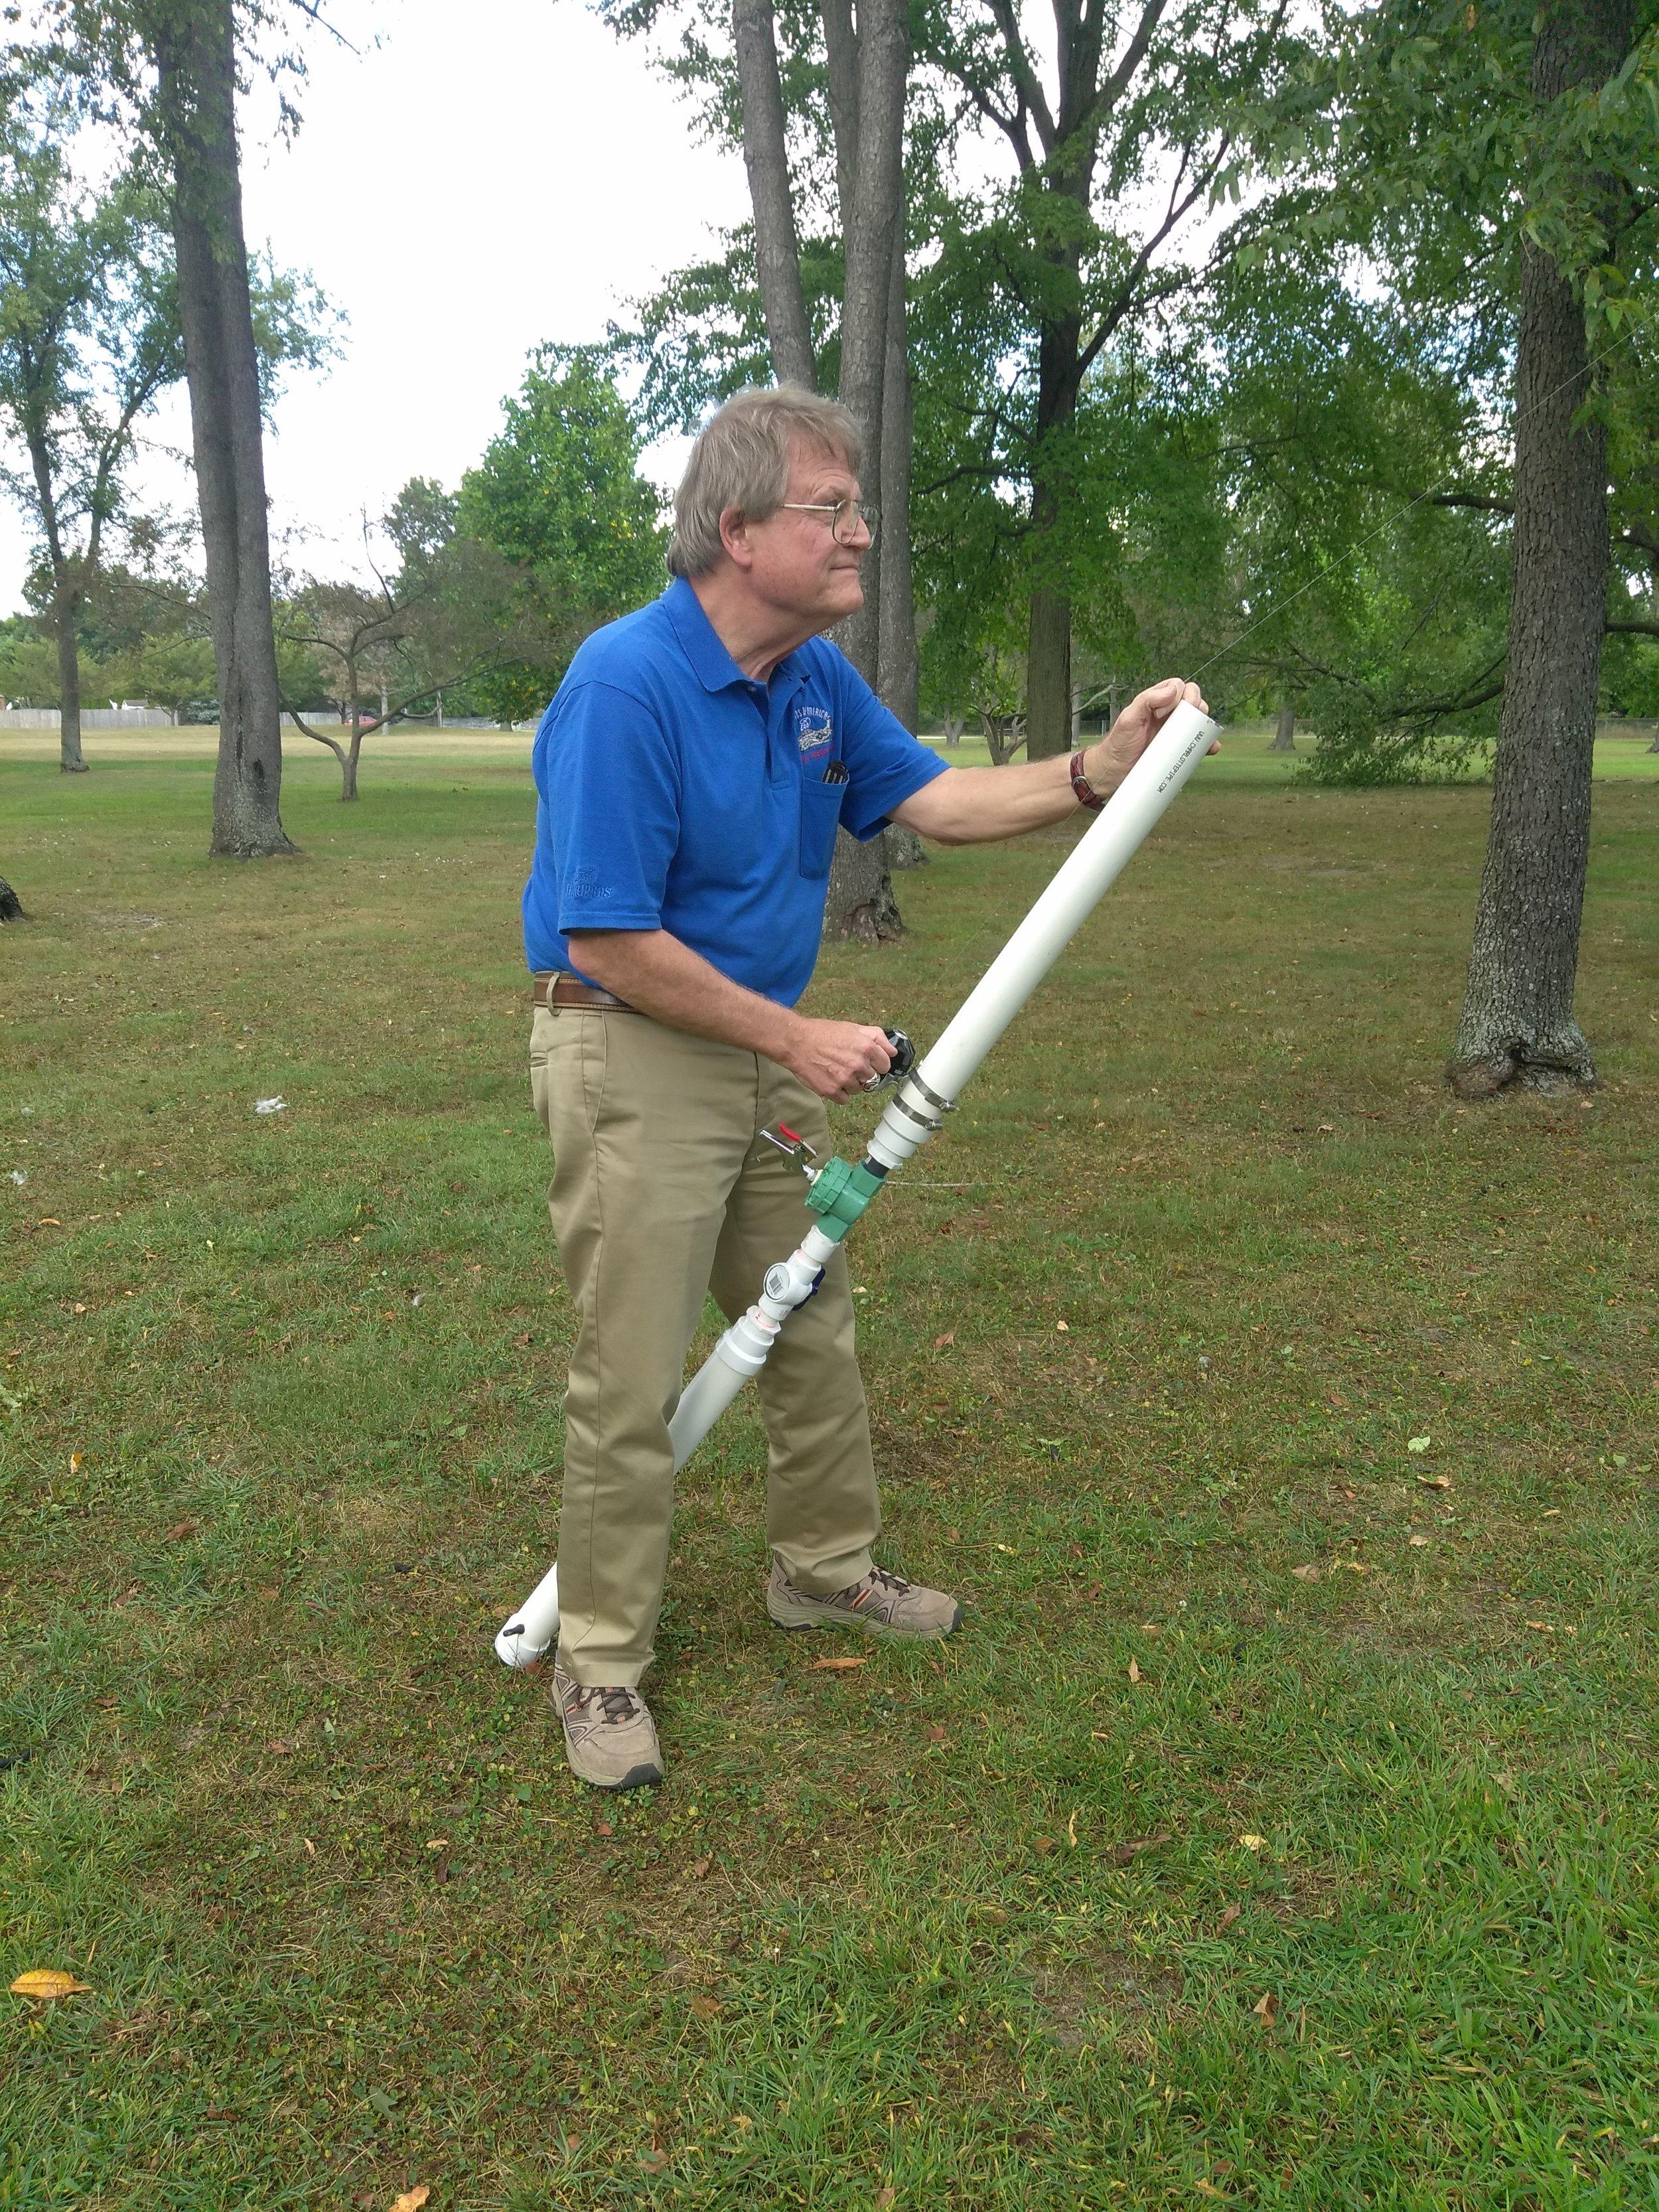 - Keith Wishmeier WA9S launching an antenna line into the trees.